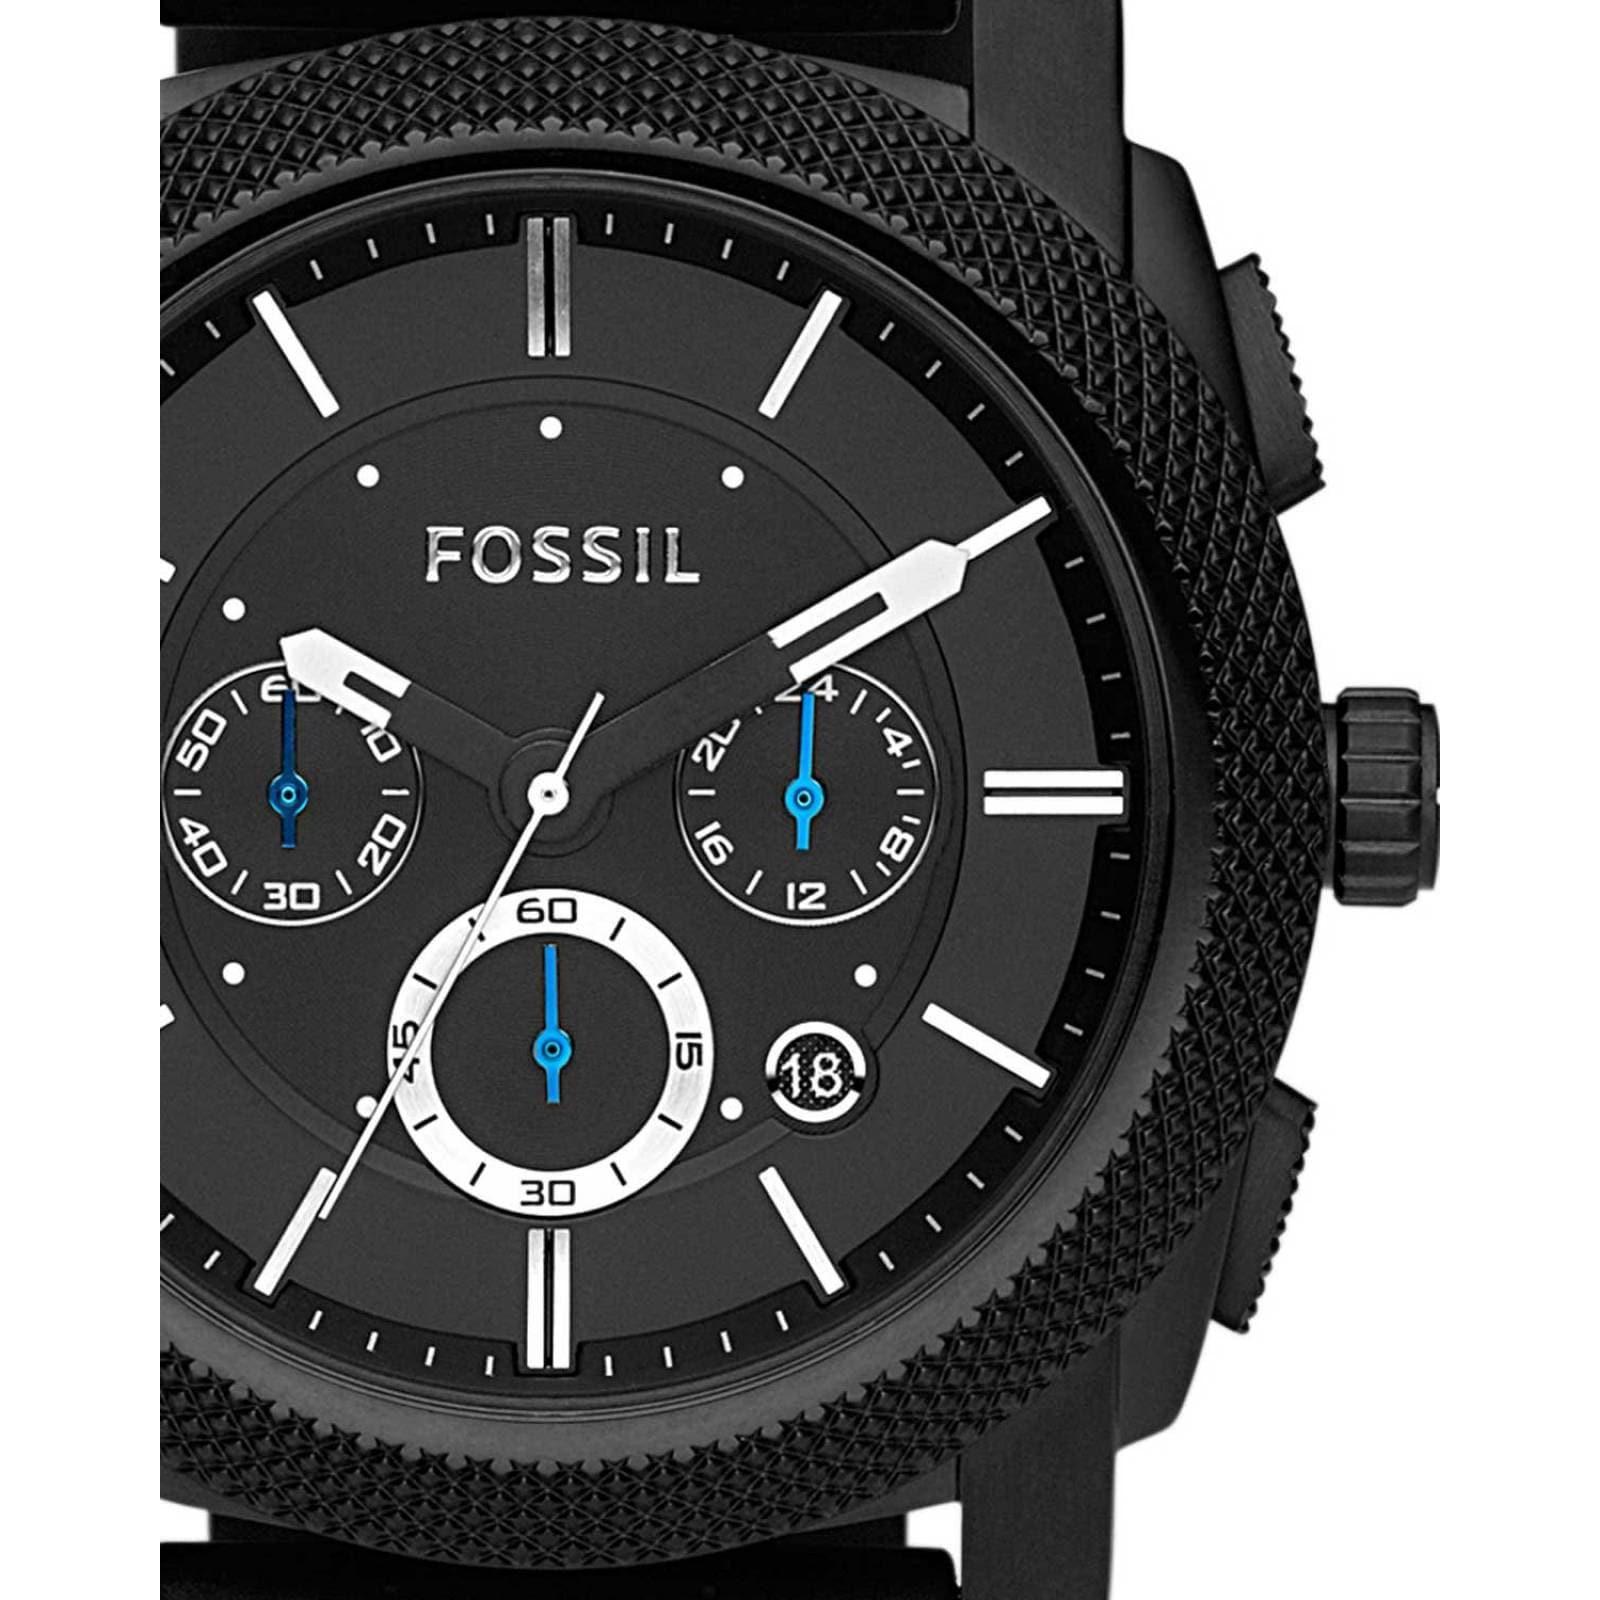 28c36fb58d1d Reloj fossil machine chronograph black silicone para caballero